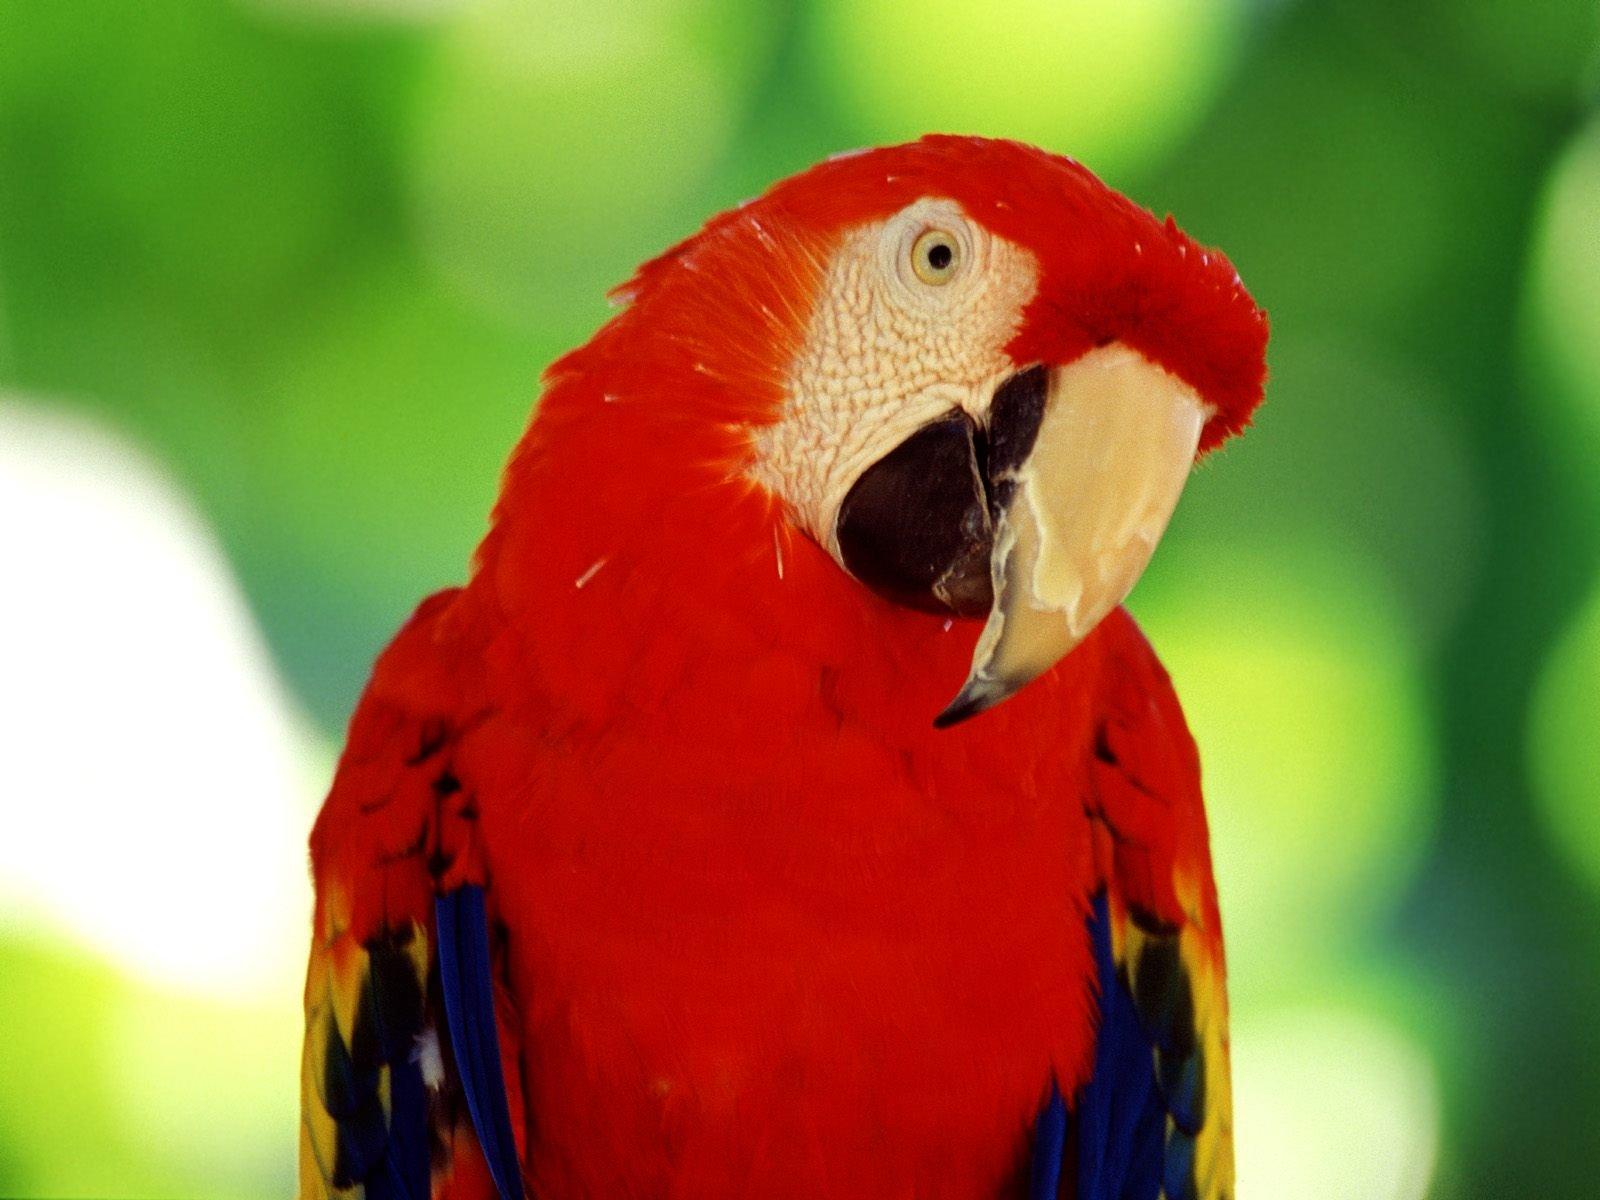 Parrot Wallpaper Live HD Wallpaper HQ Pictures Images Photos 1600x1200